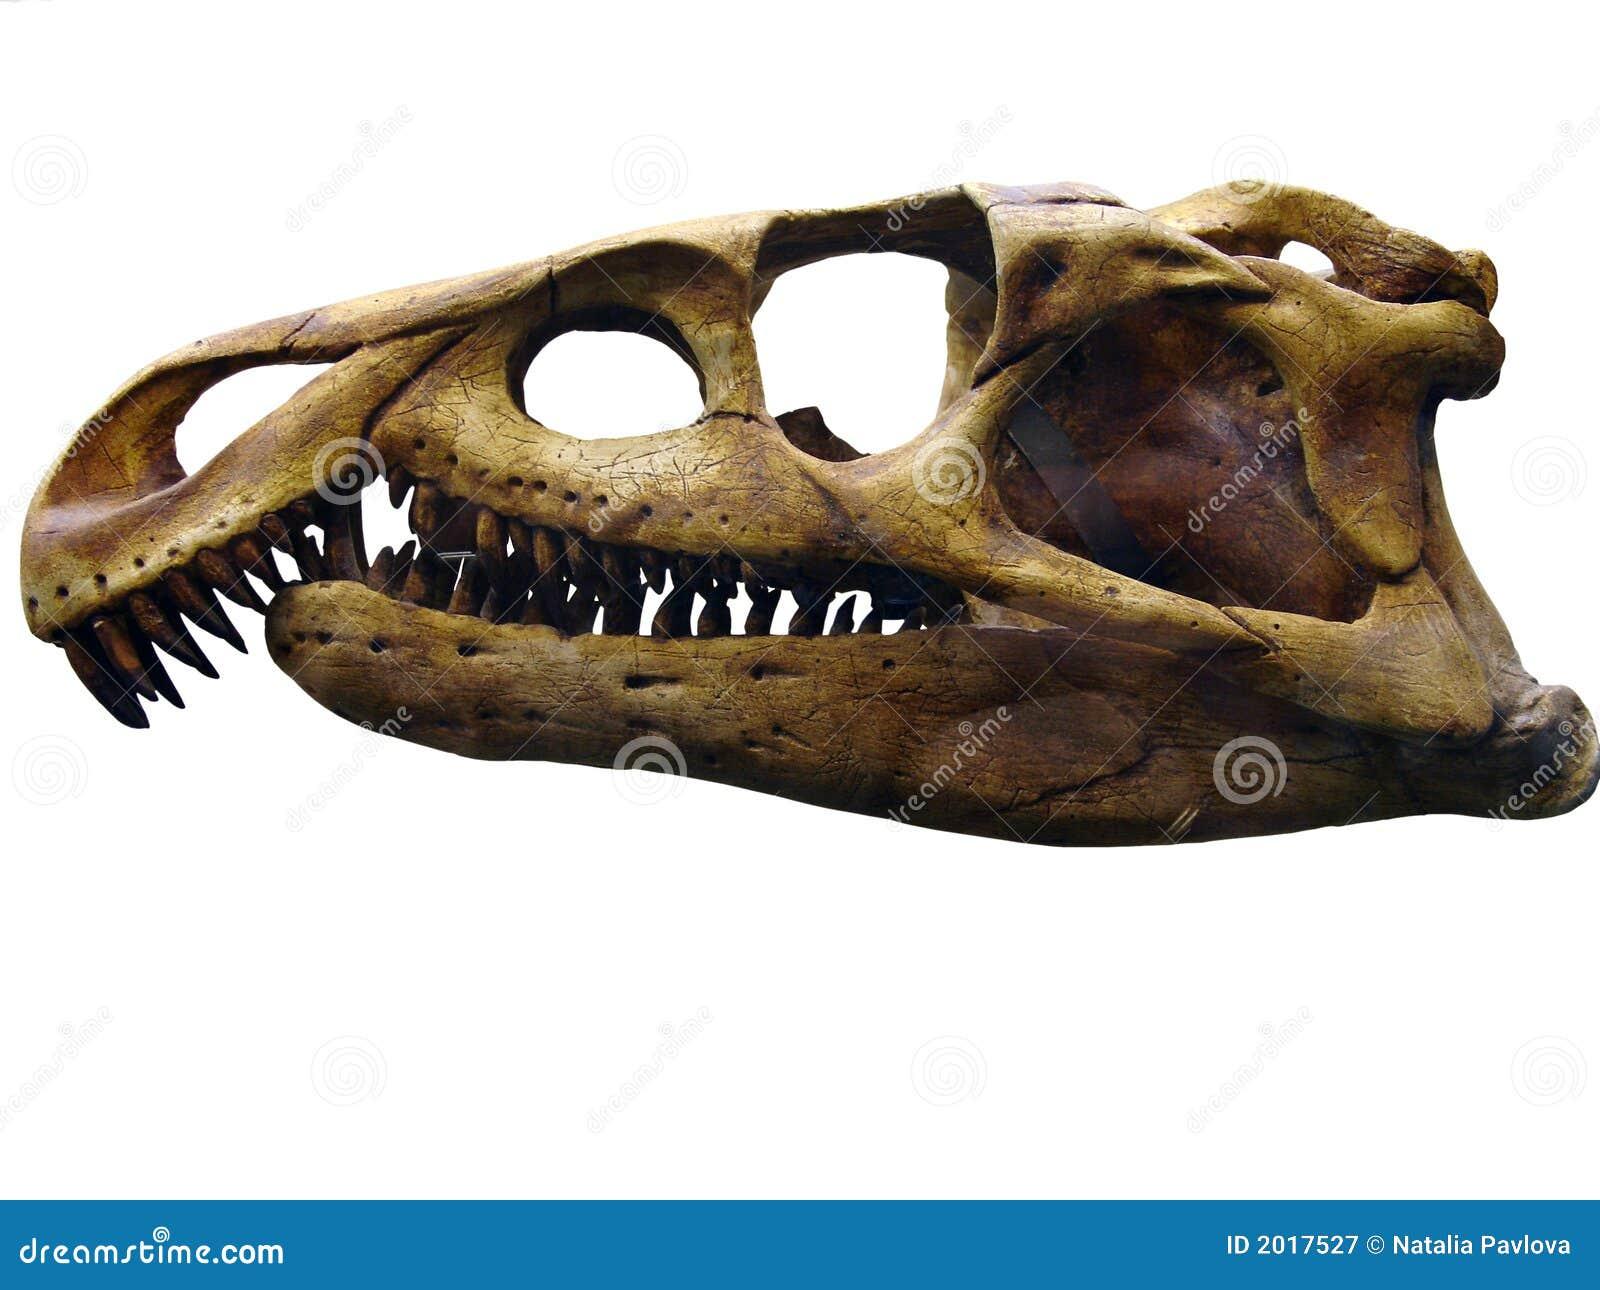 Reptilian skull